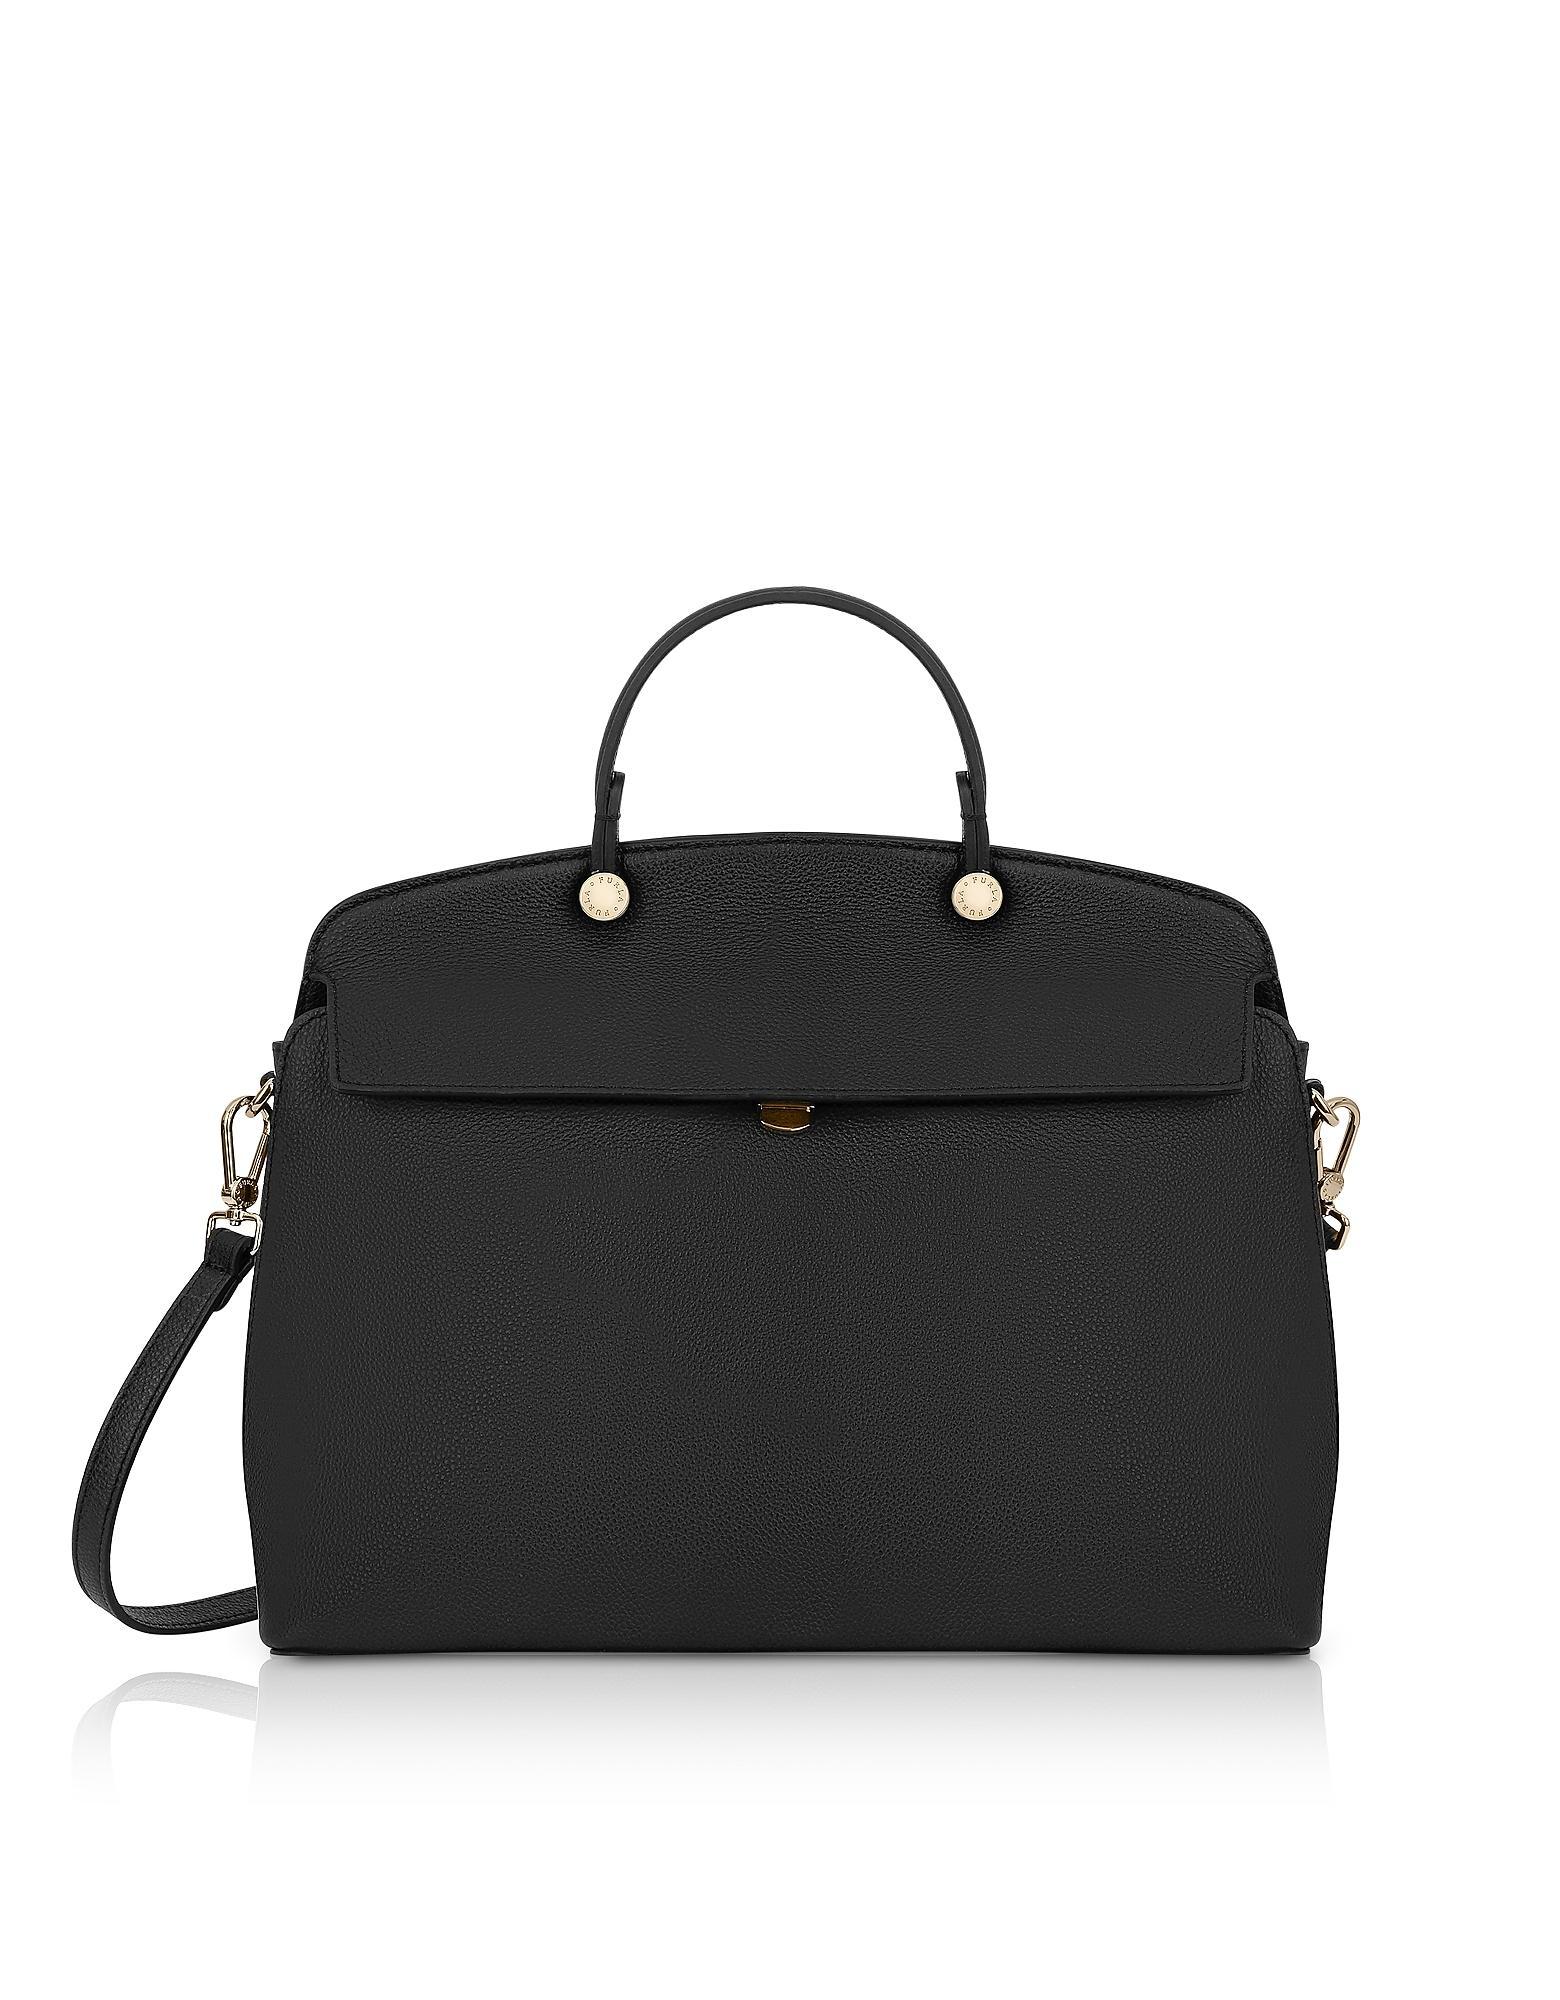 Furla Onyx Leather My Piper Medium Top Handle Satchel Bag In Black